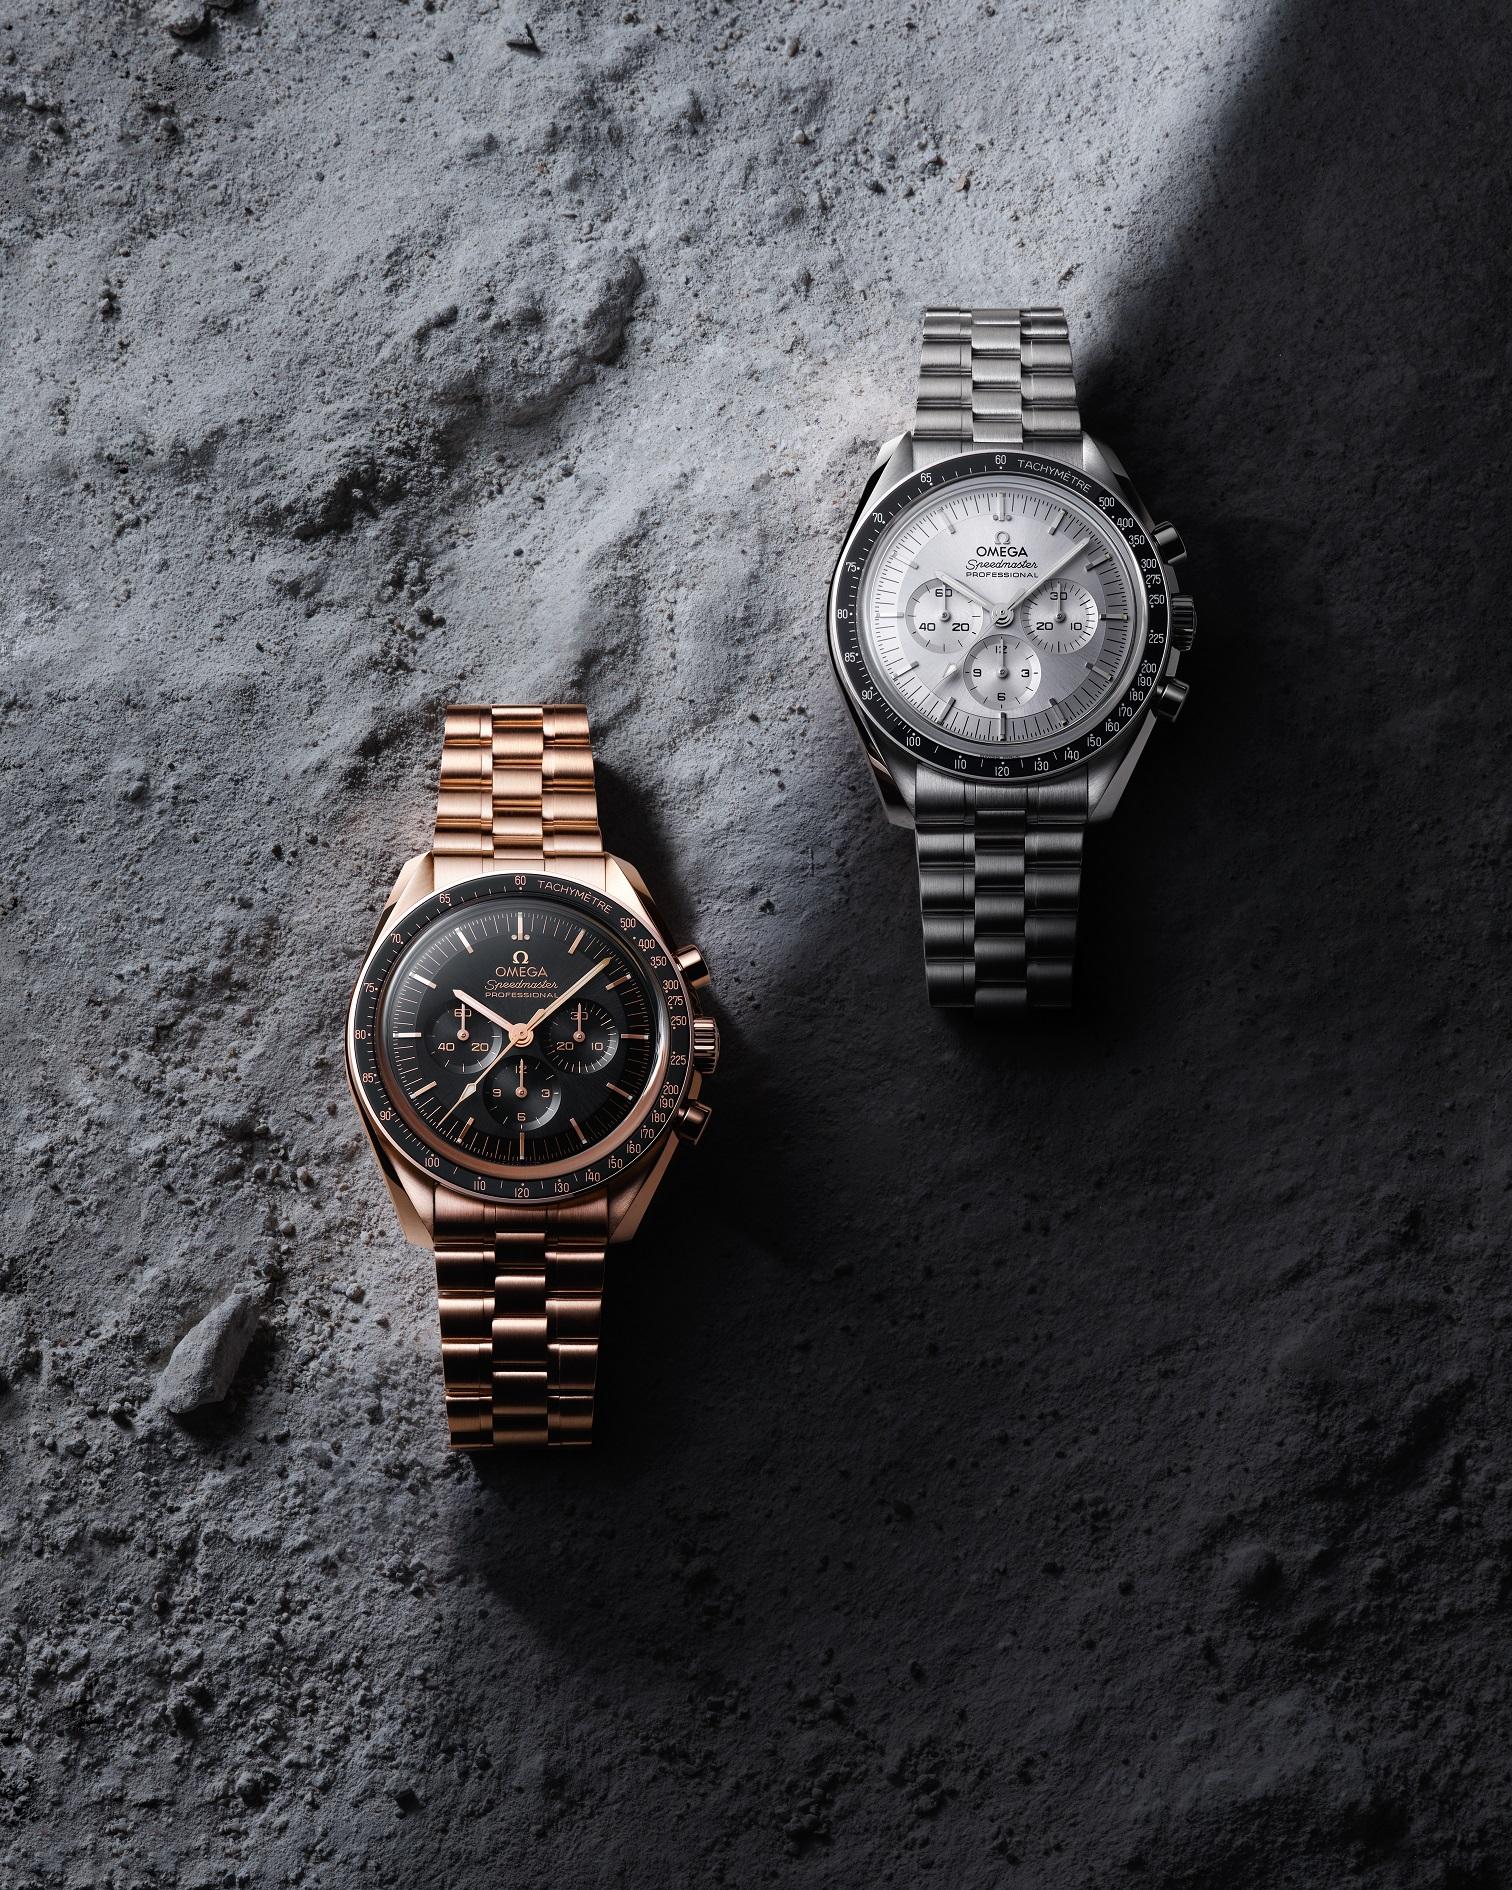 Omega Speedmaster Moonwatch 310.60.42.50.01.001 y 310.60.42.50.02.001